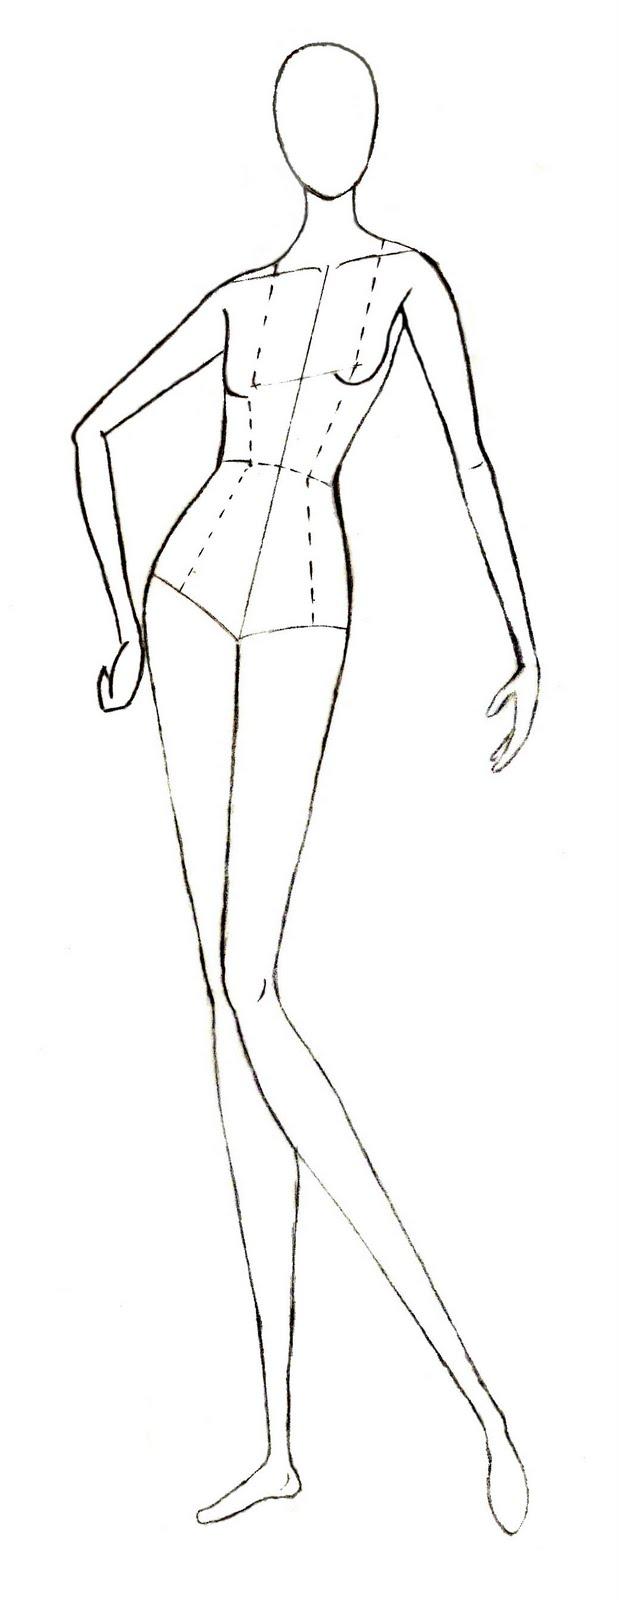 28 How To Draw Fashion Templates Fashion Sketch Templates